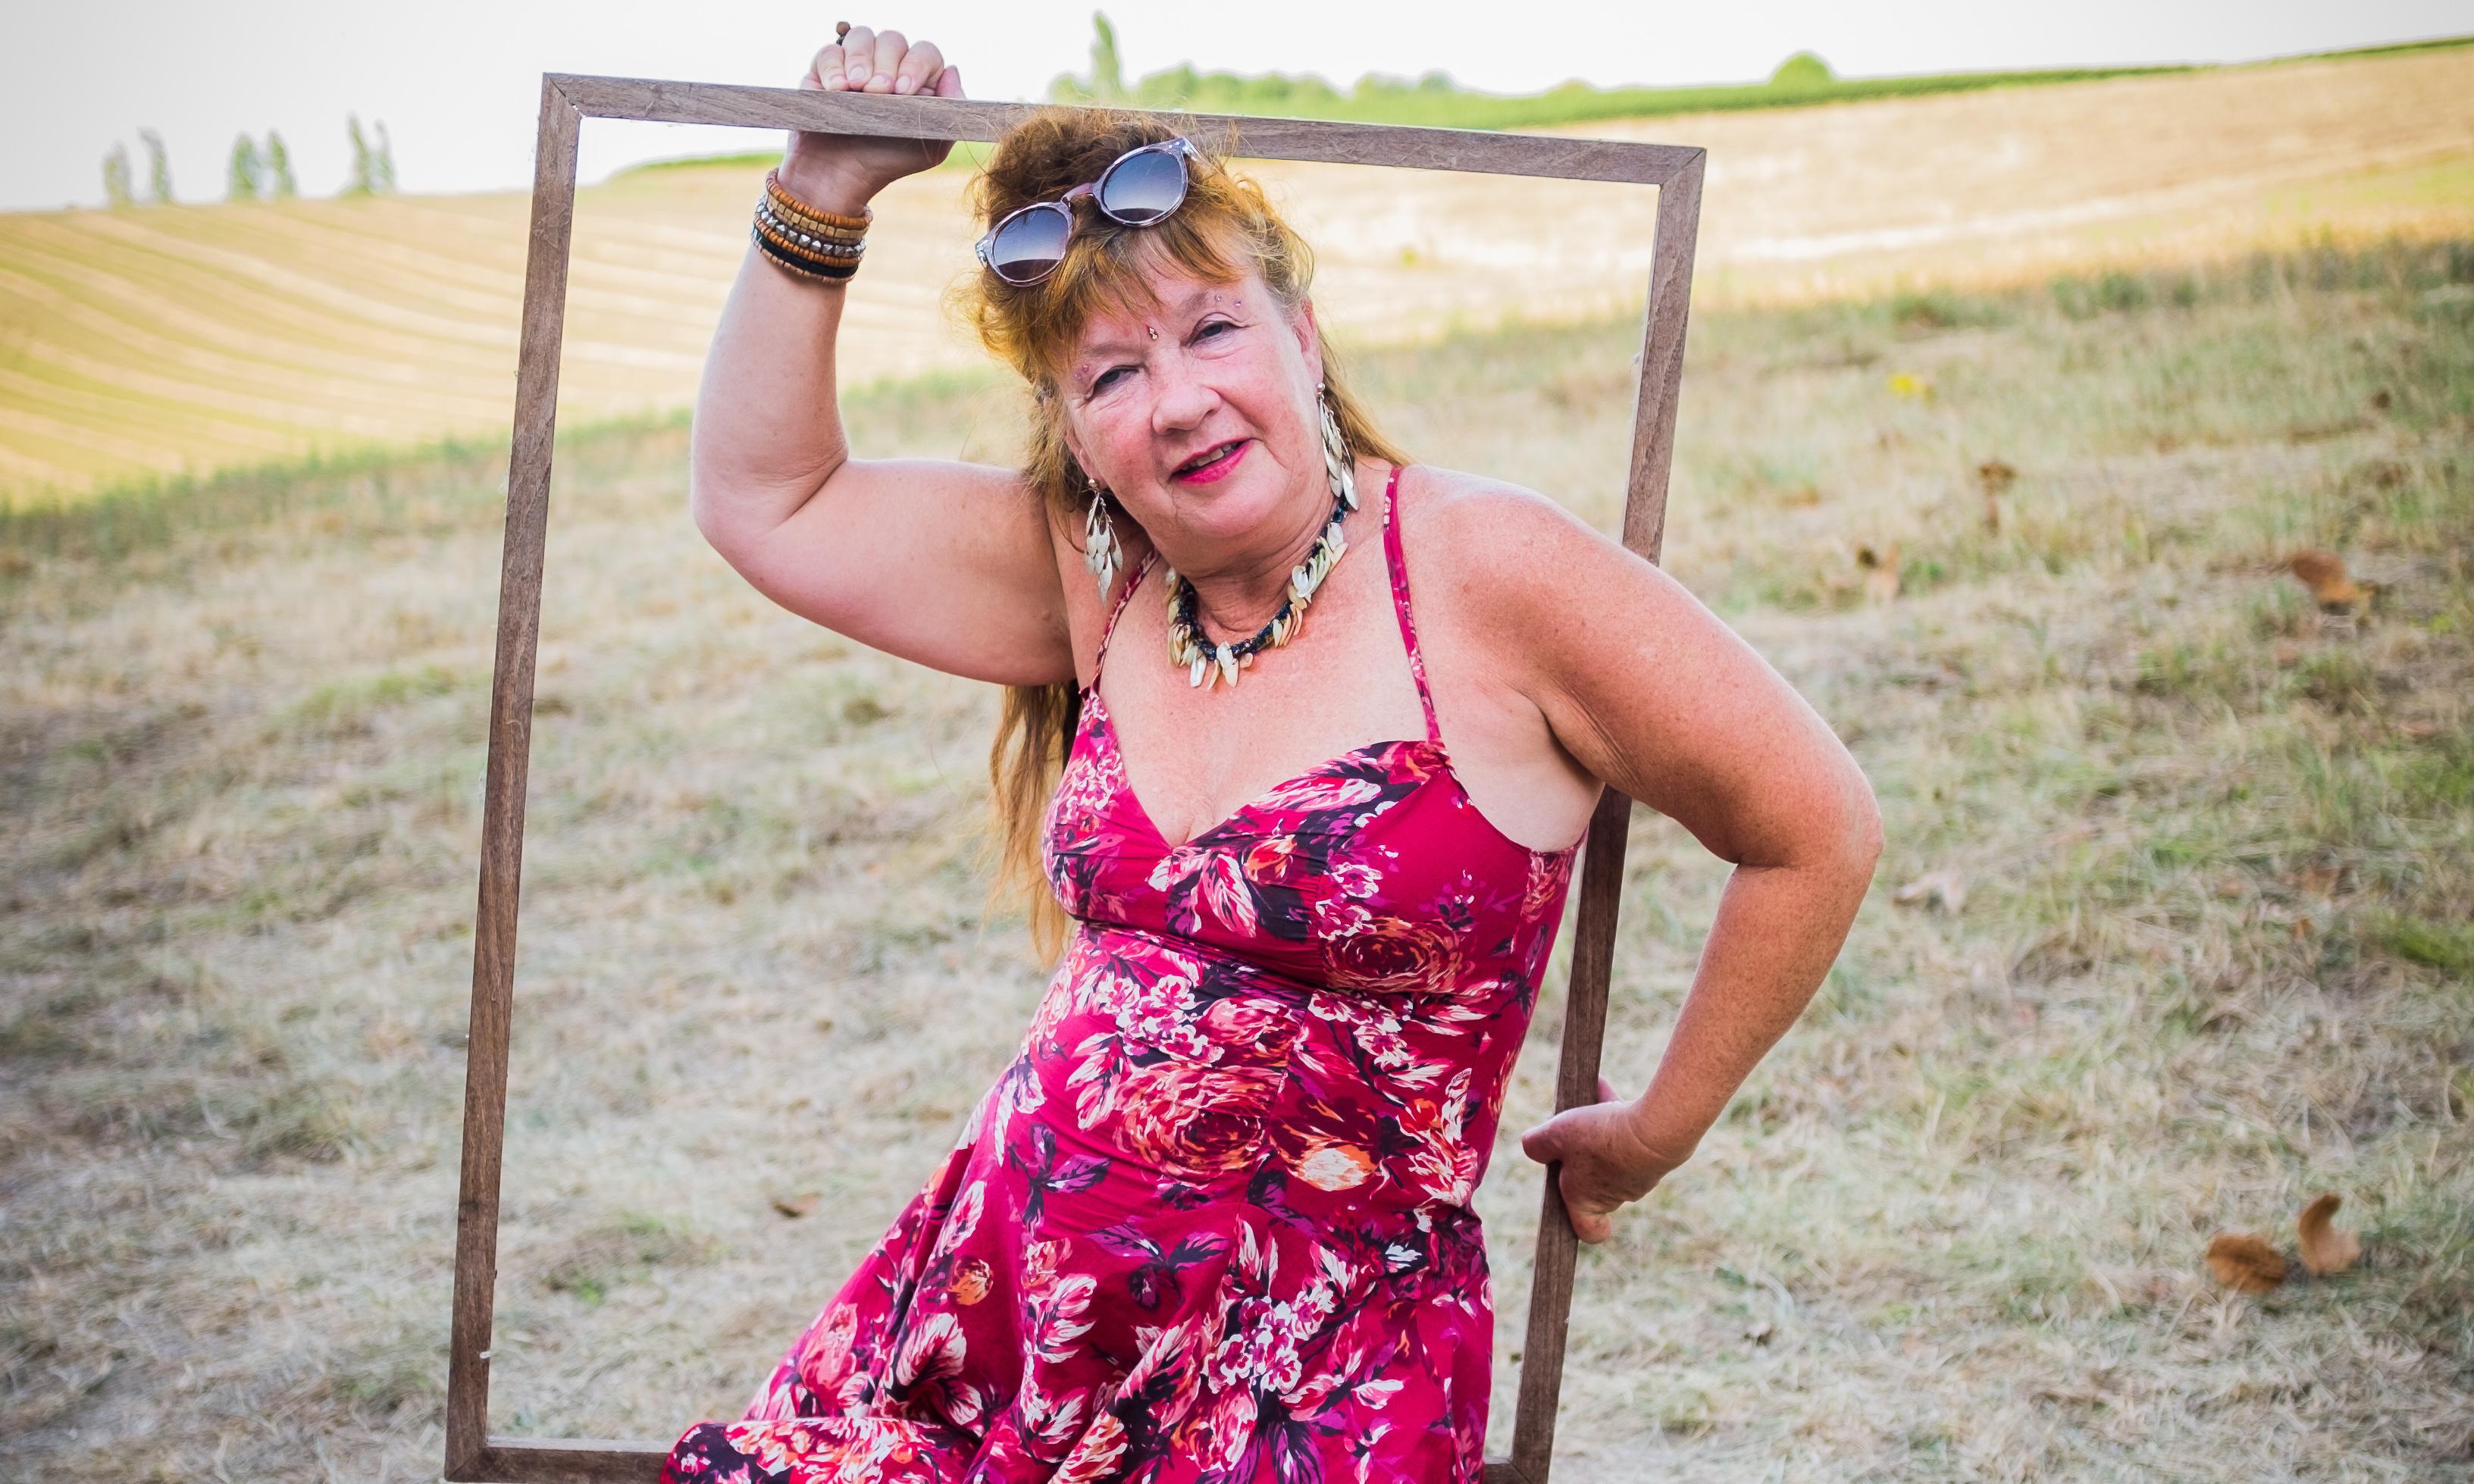 I am a woman in my 60s – that doesn't make me a granny